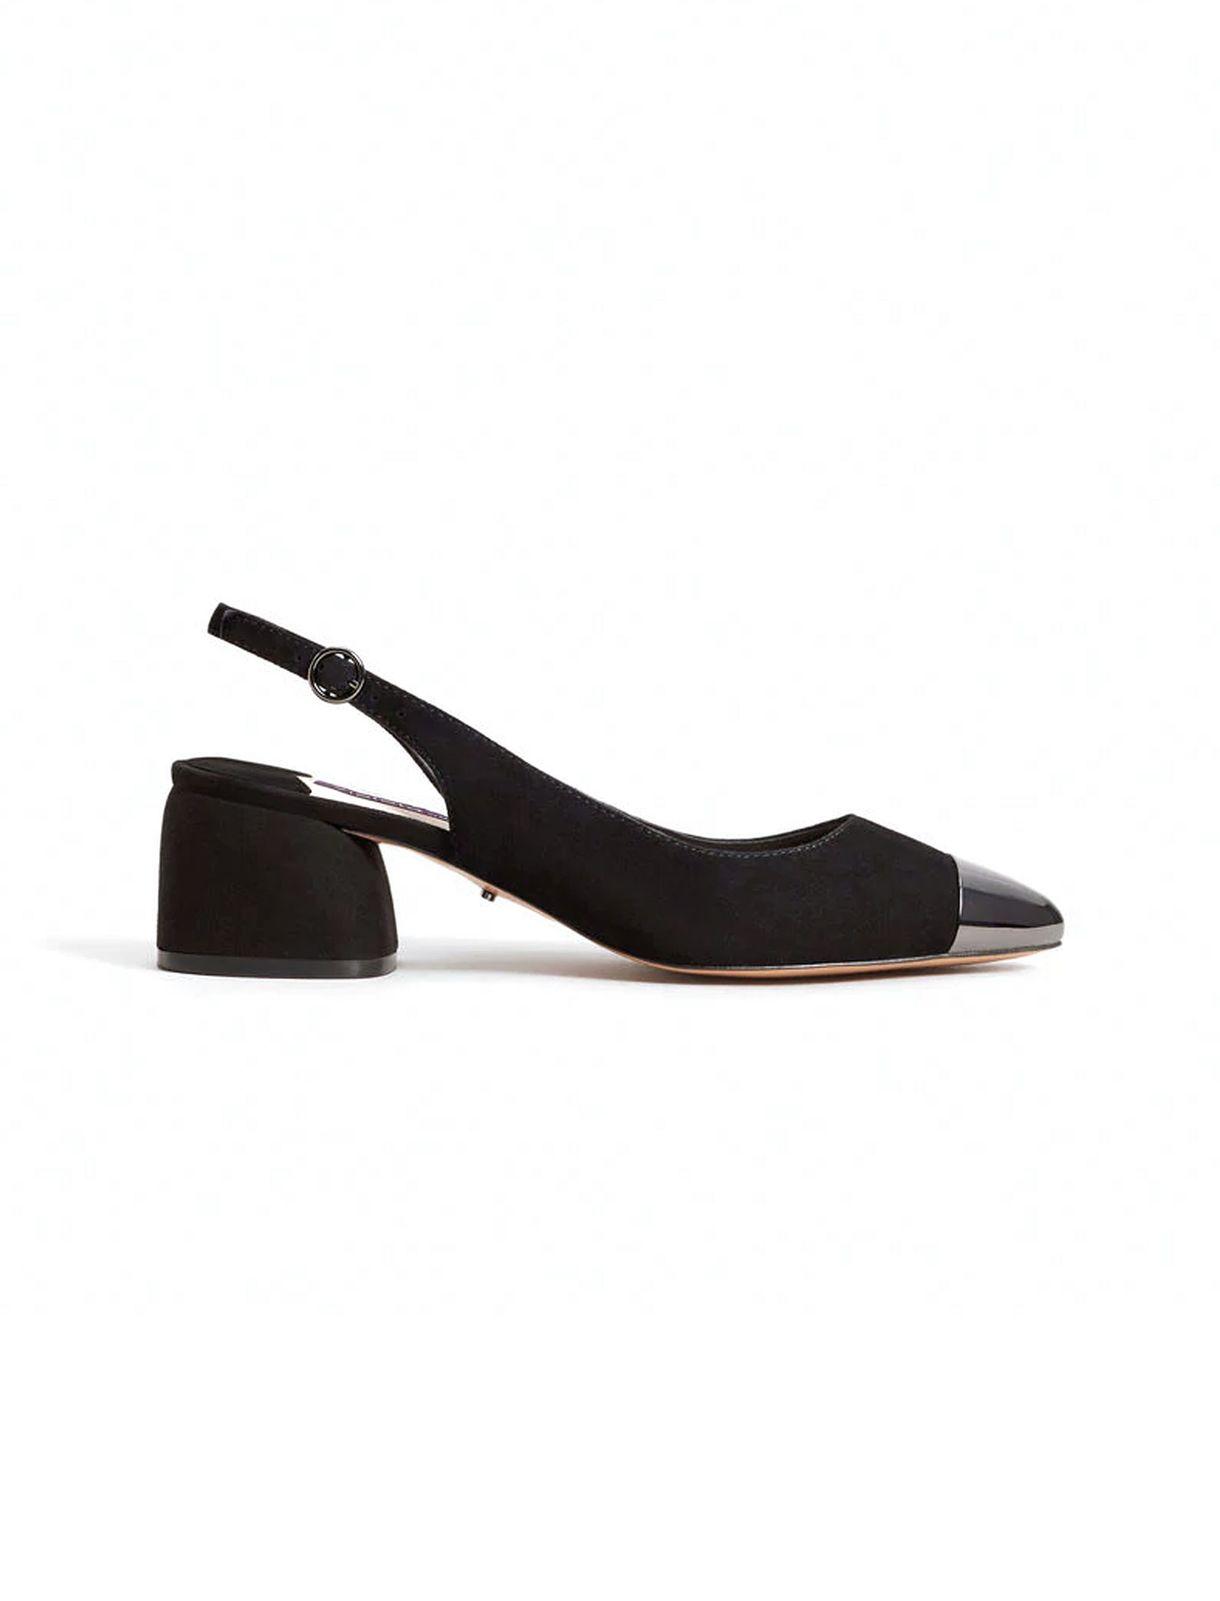 کفش پاشنه بلند زنانه – ویولتا بای مانگو  Women High Heel Shoes – Violeta BY MANGO